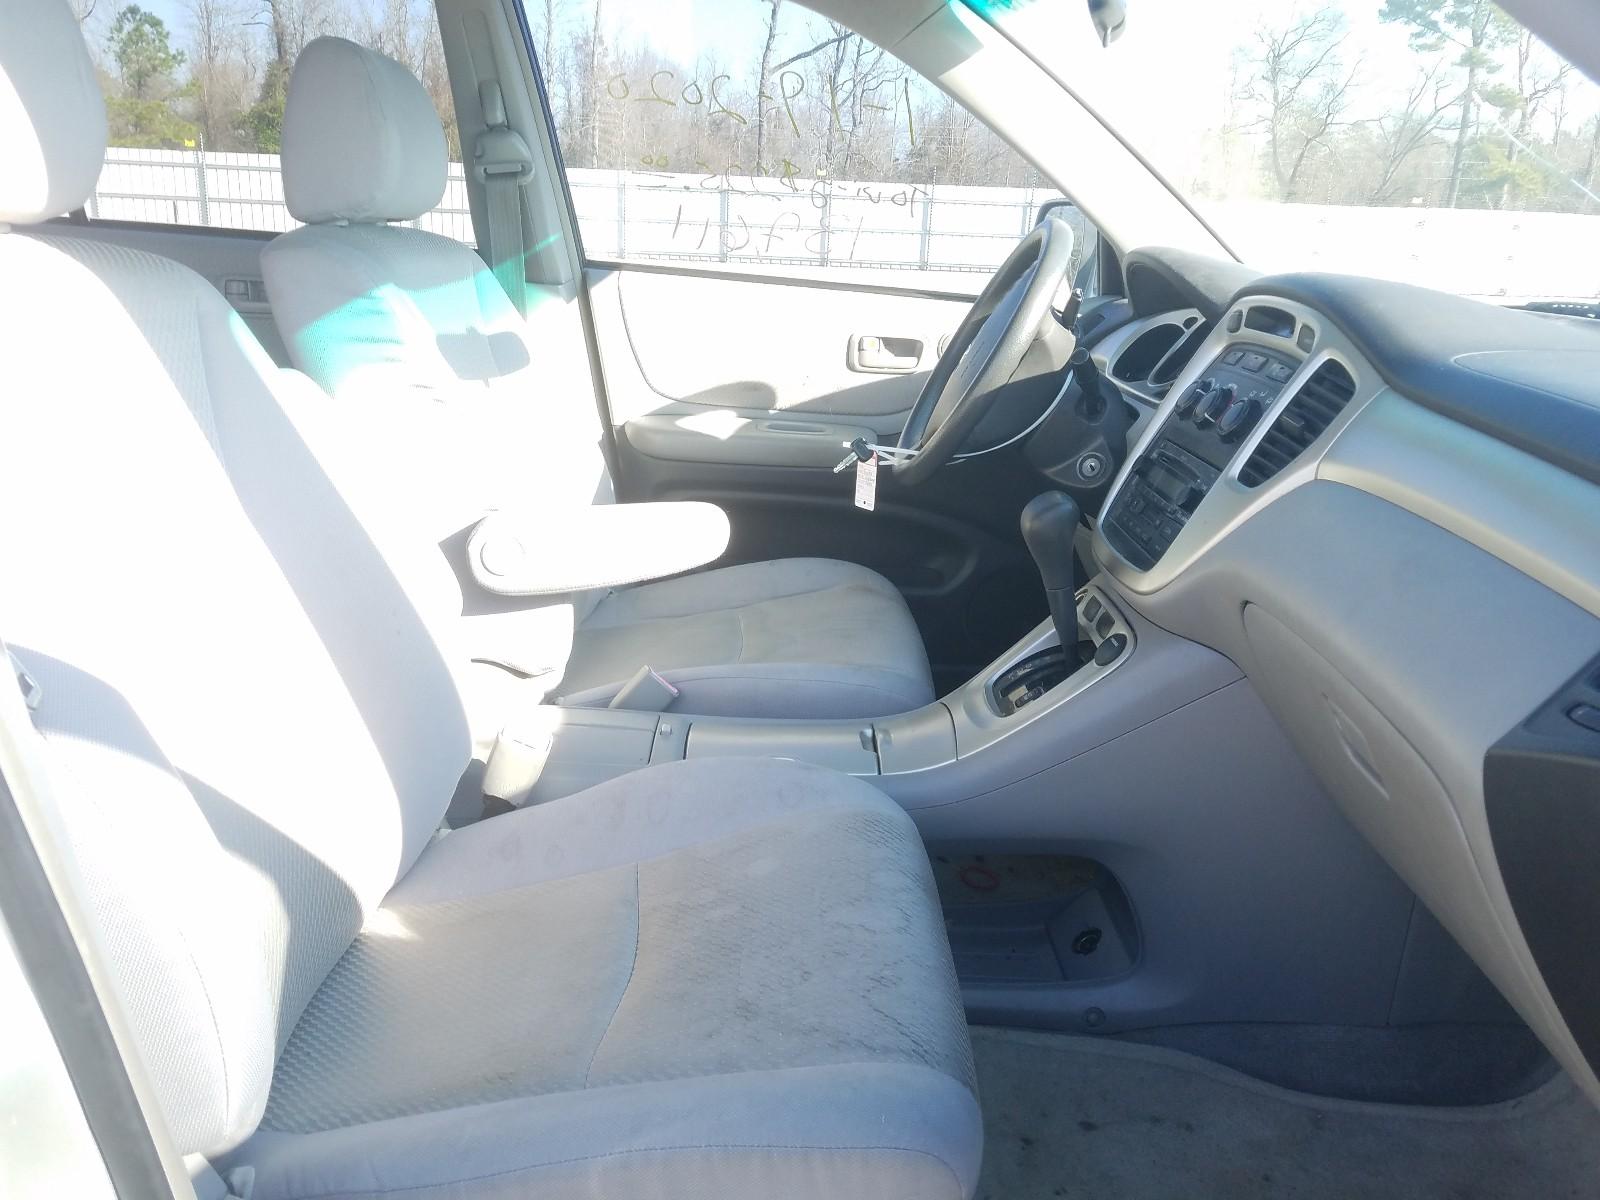 JTEGD21A060132850 - 2006 Toyota Highlander 2.4L close up View